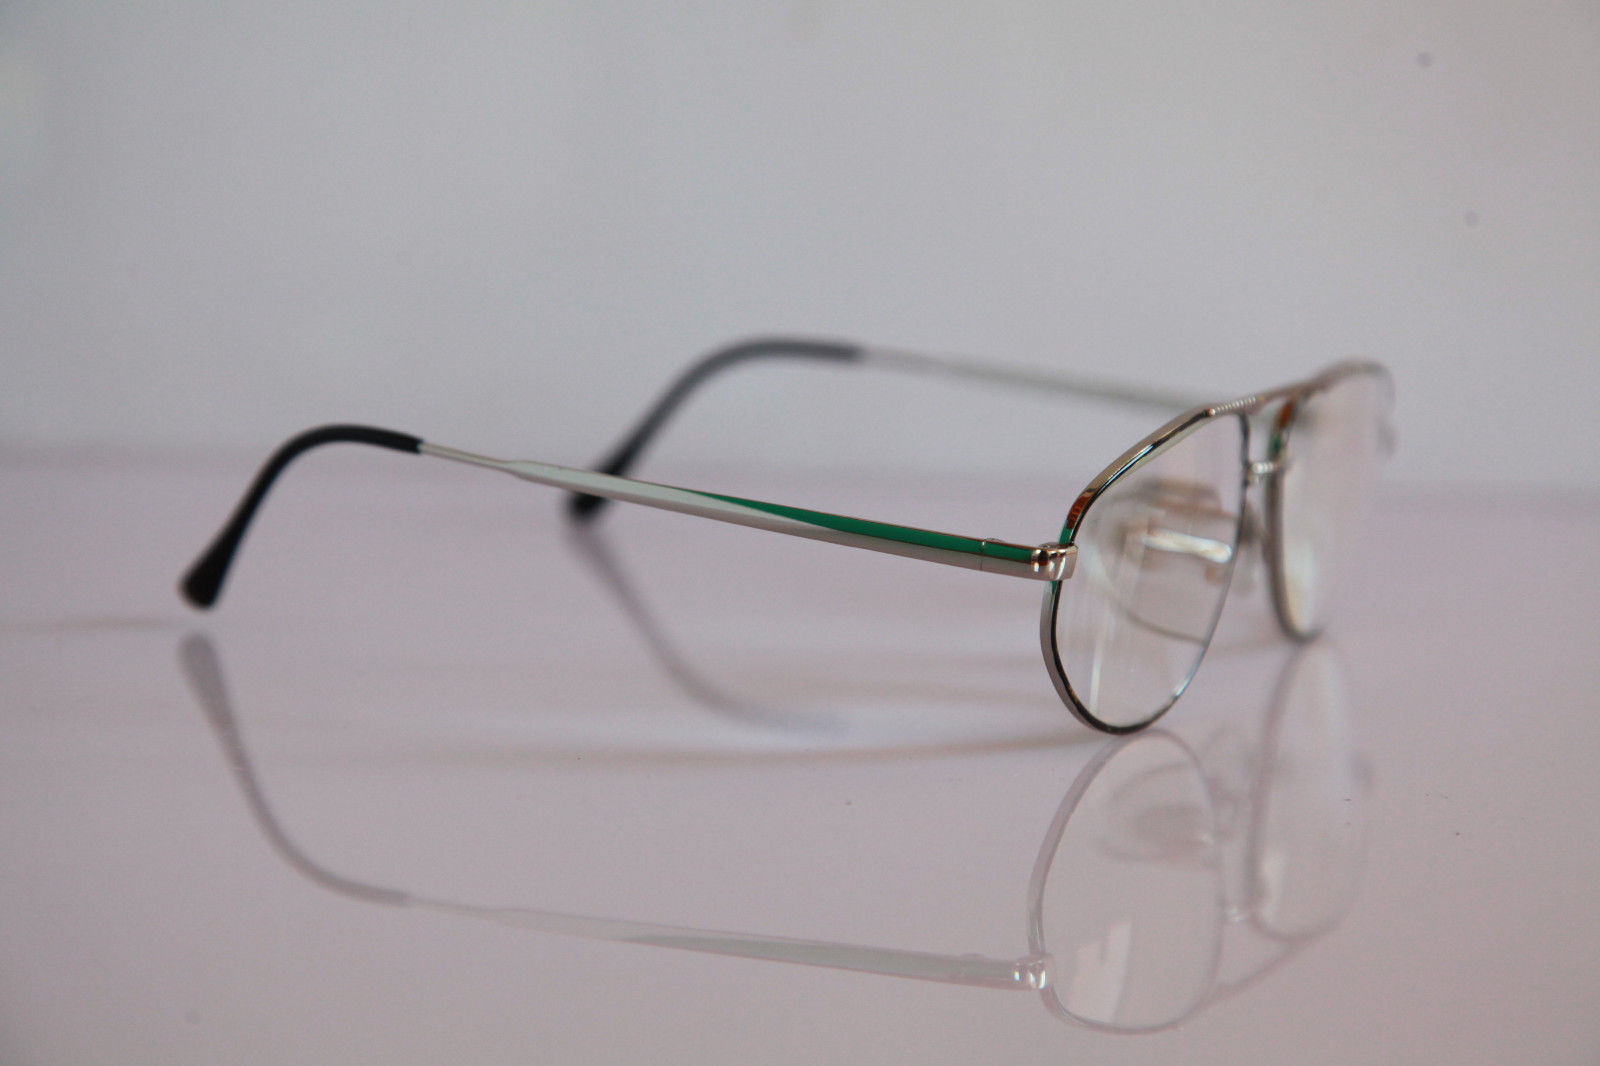 APOLLO-OPTIK Eyewear, Chrome Frame,  RX-Able Prescription lens. Germany